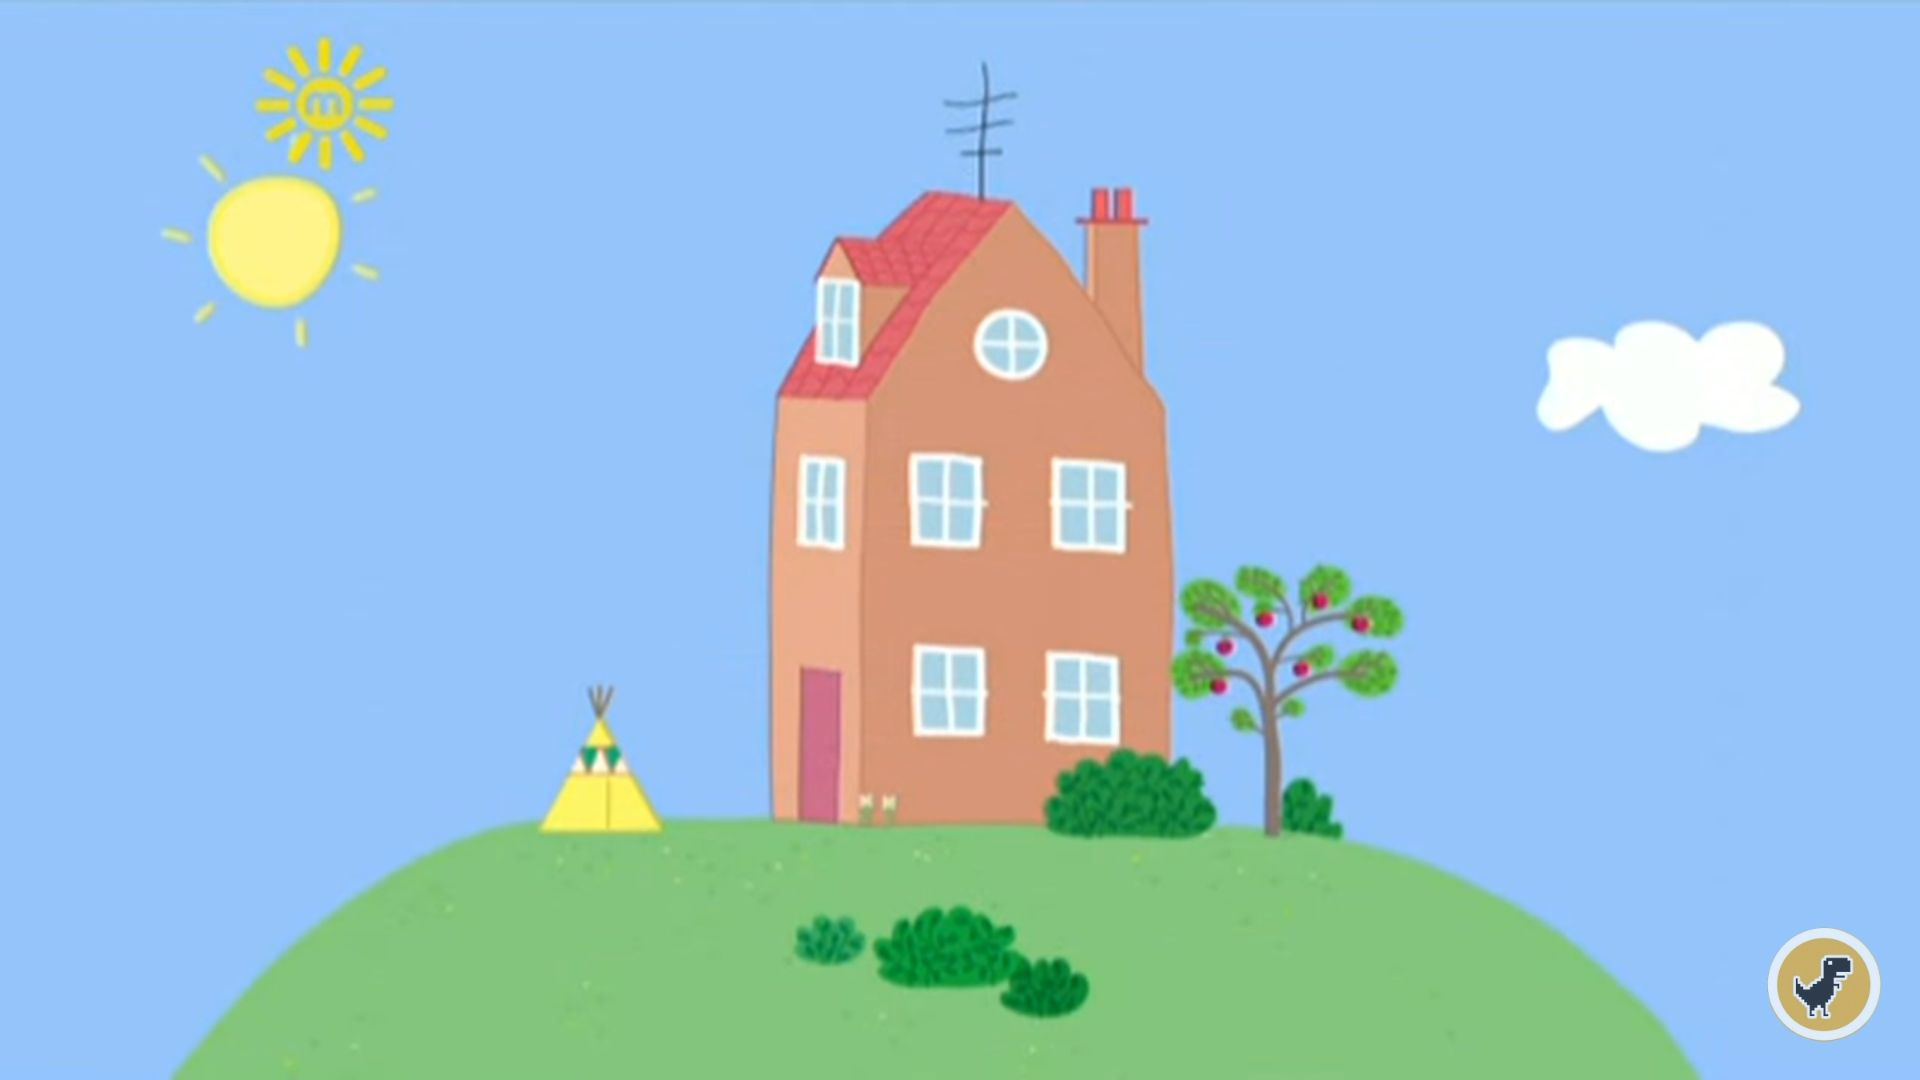 Peppa Pig House Wallpapers - Top Free Peppa Pig House ...